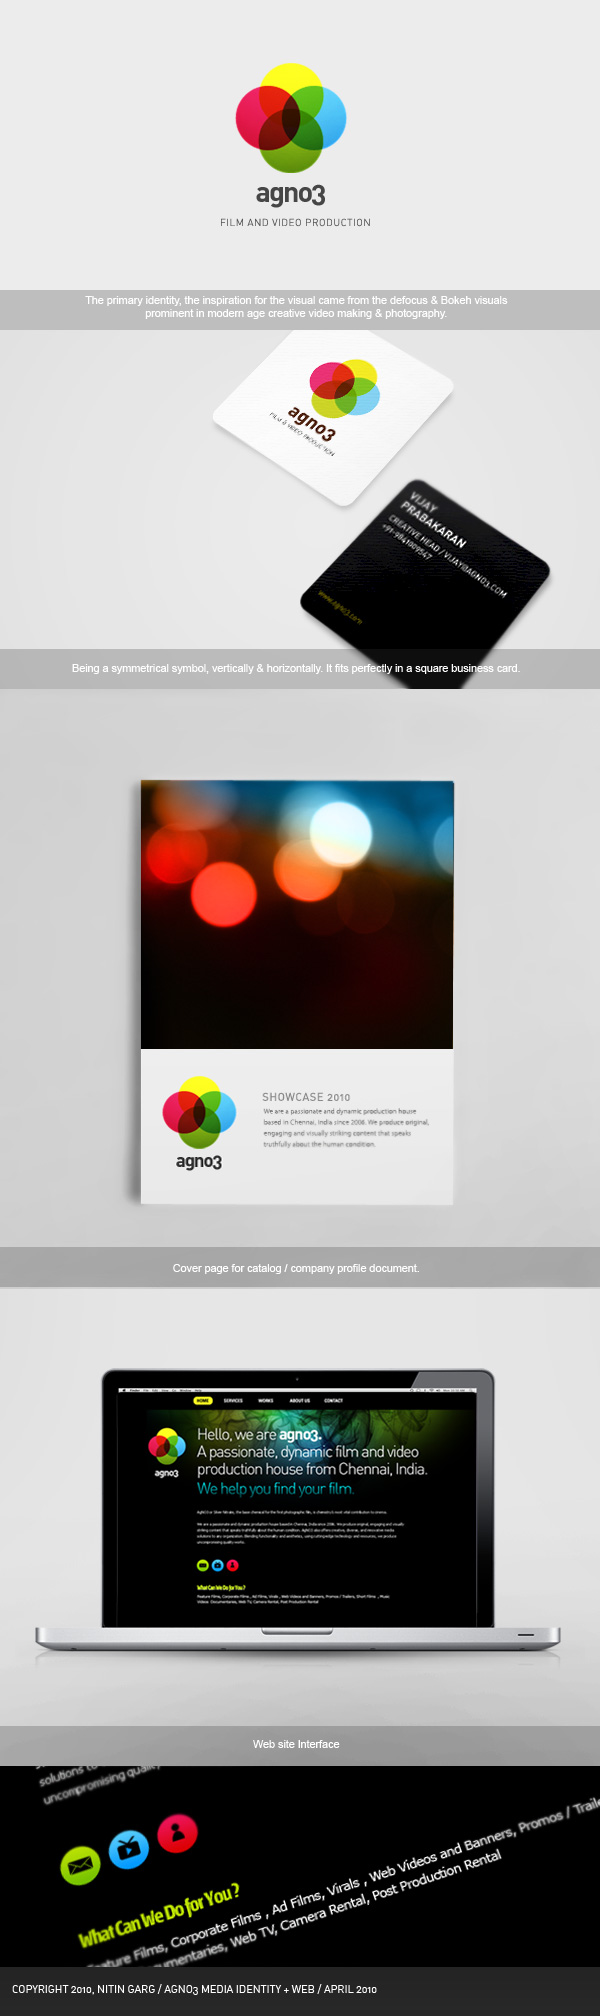 AgNO3 Media - Identity and Web